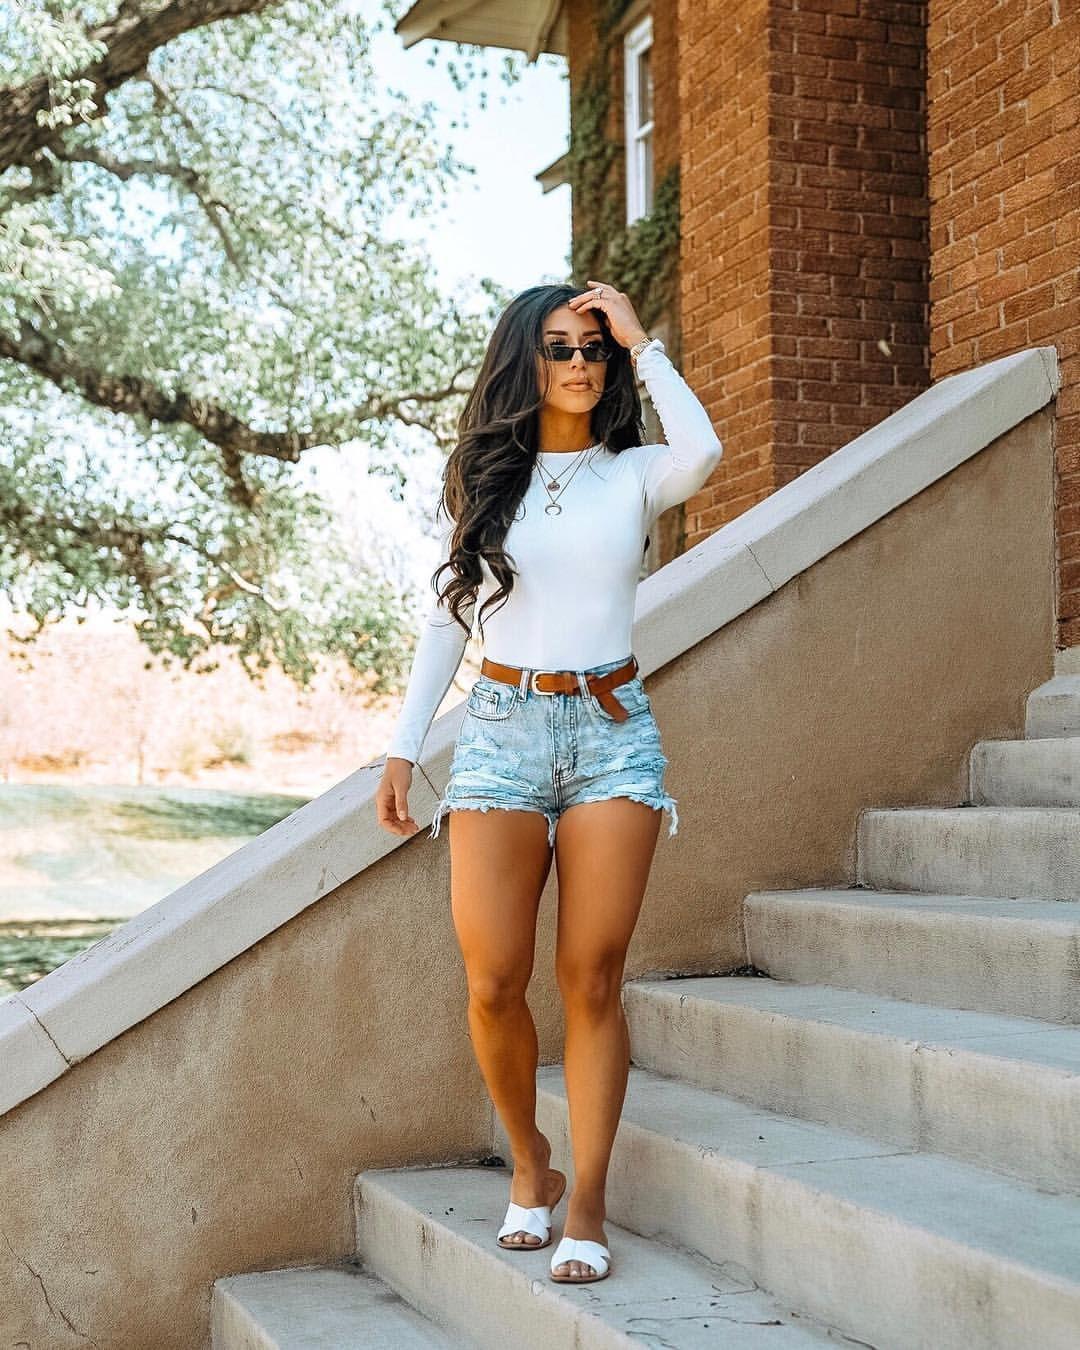 Yvetteg26 on Instagram: High waisted distressed denim shorts, tan